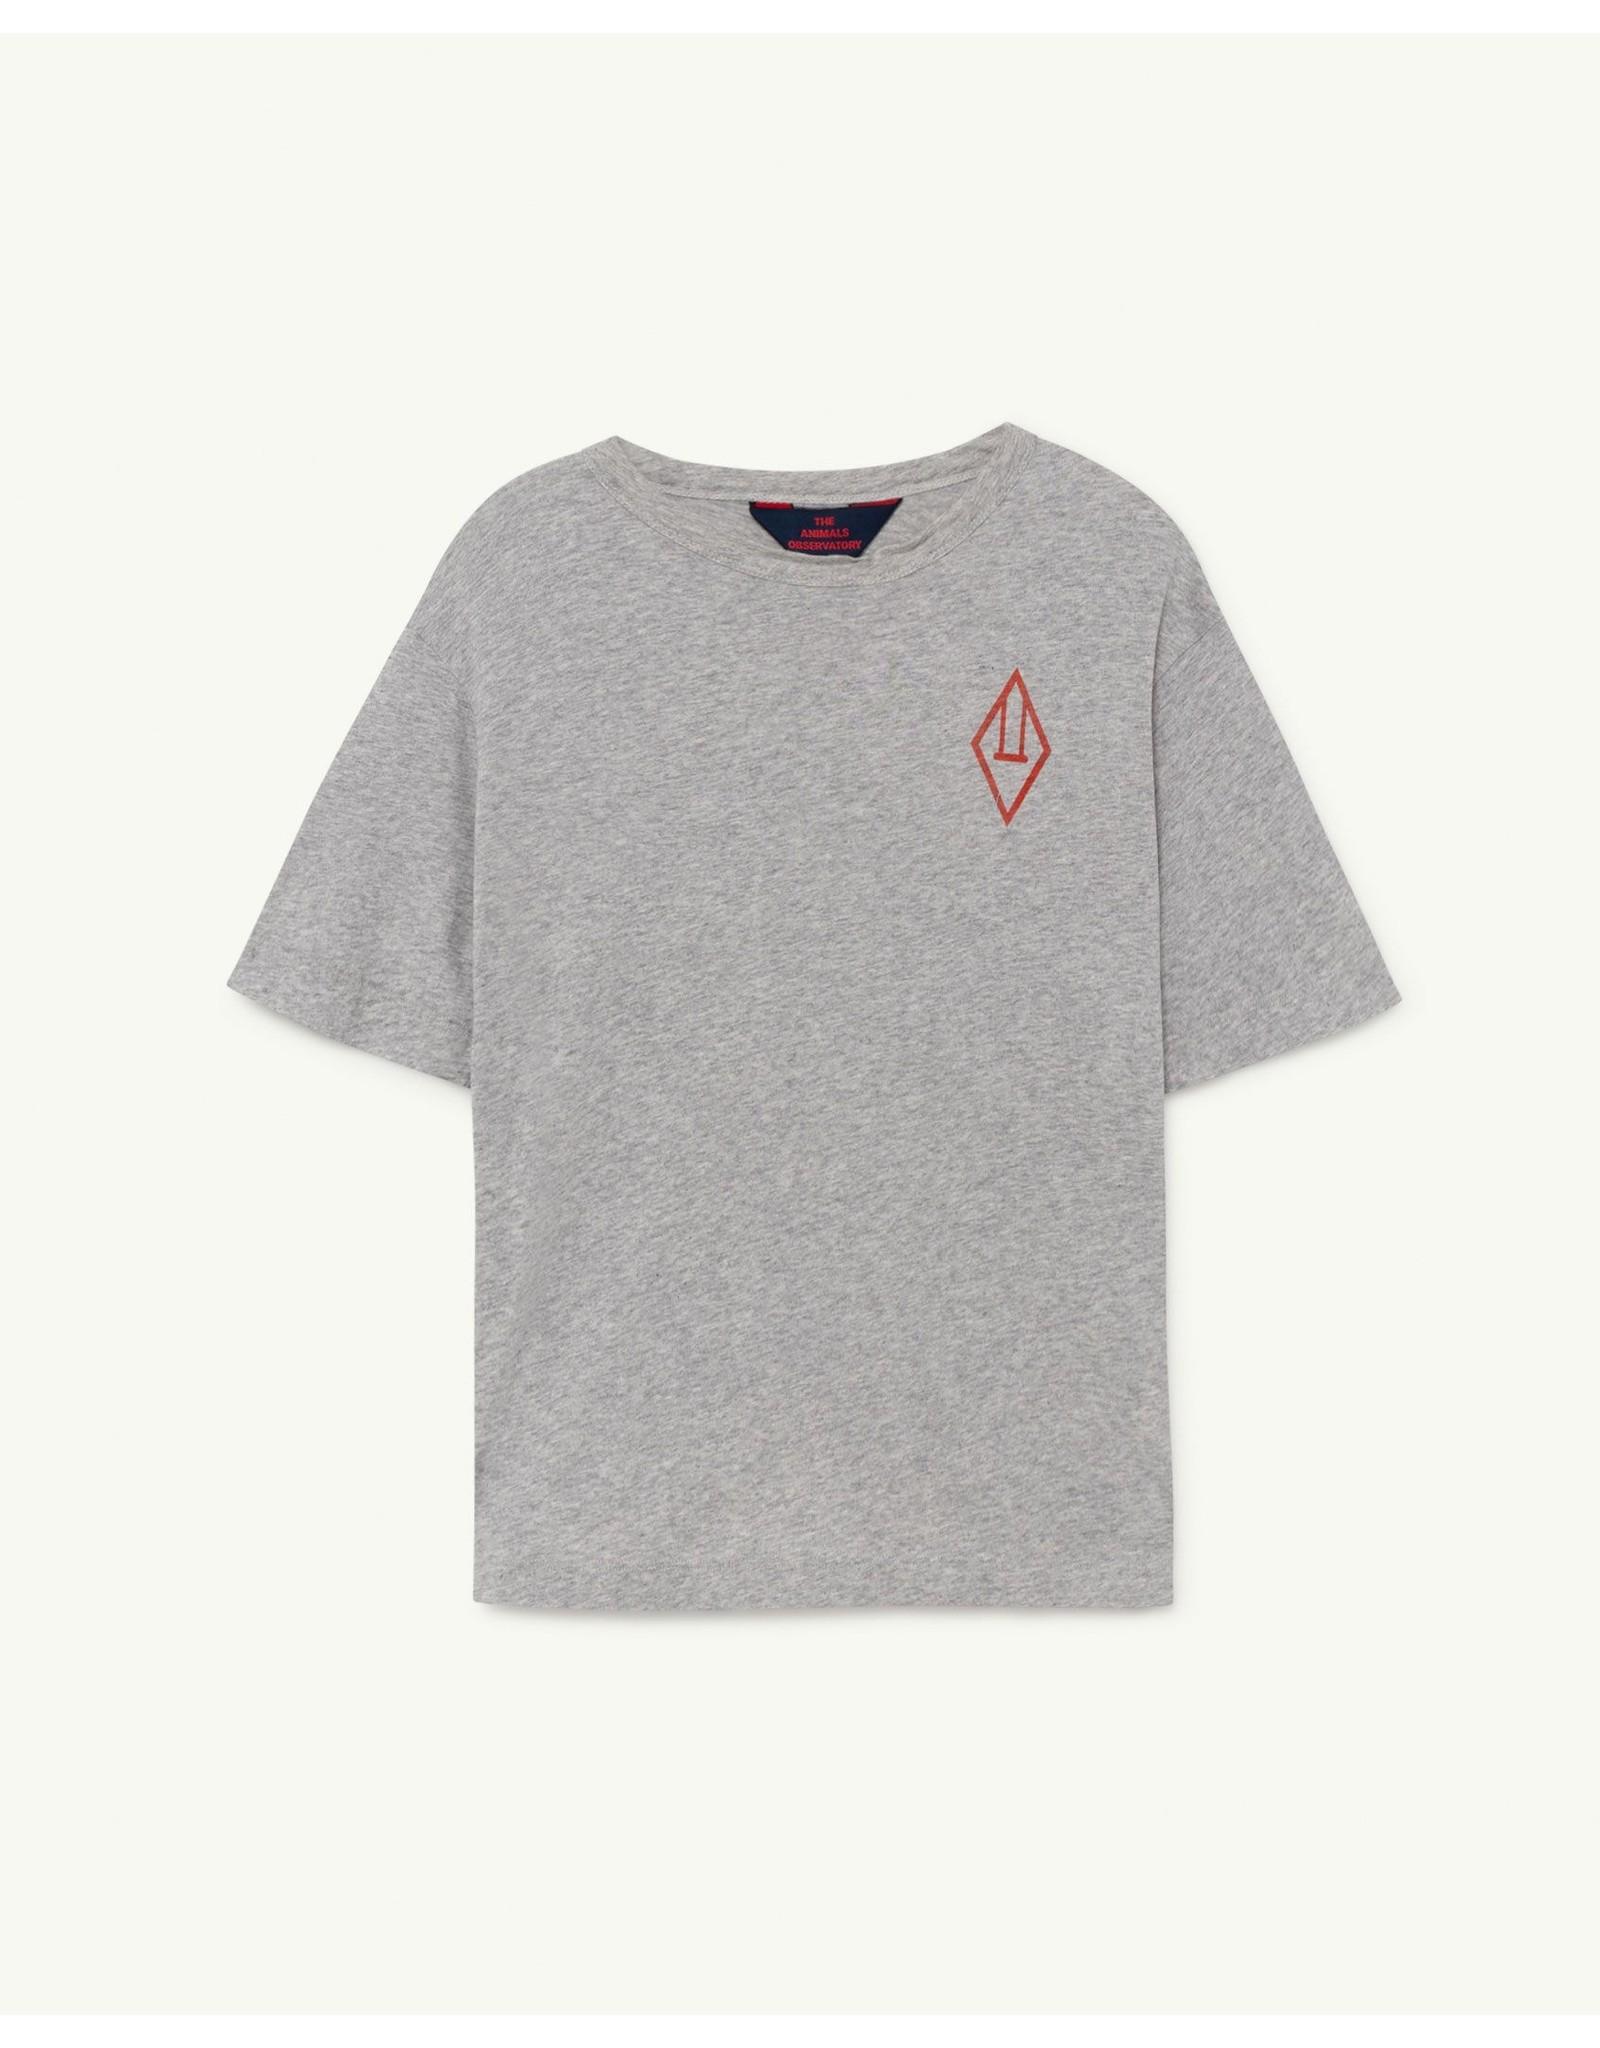 TAO SS21044 Rooster oversize t-shirt grey logo